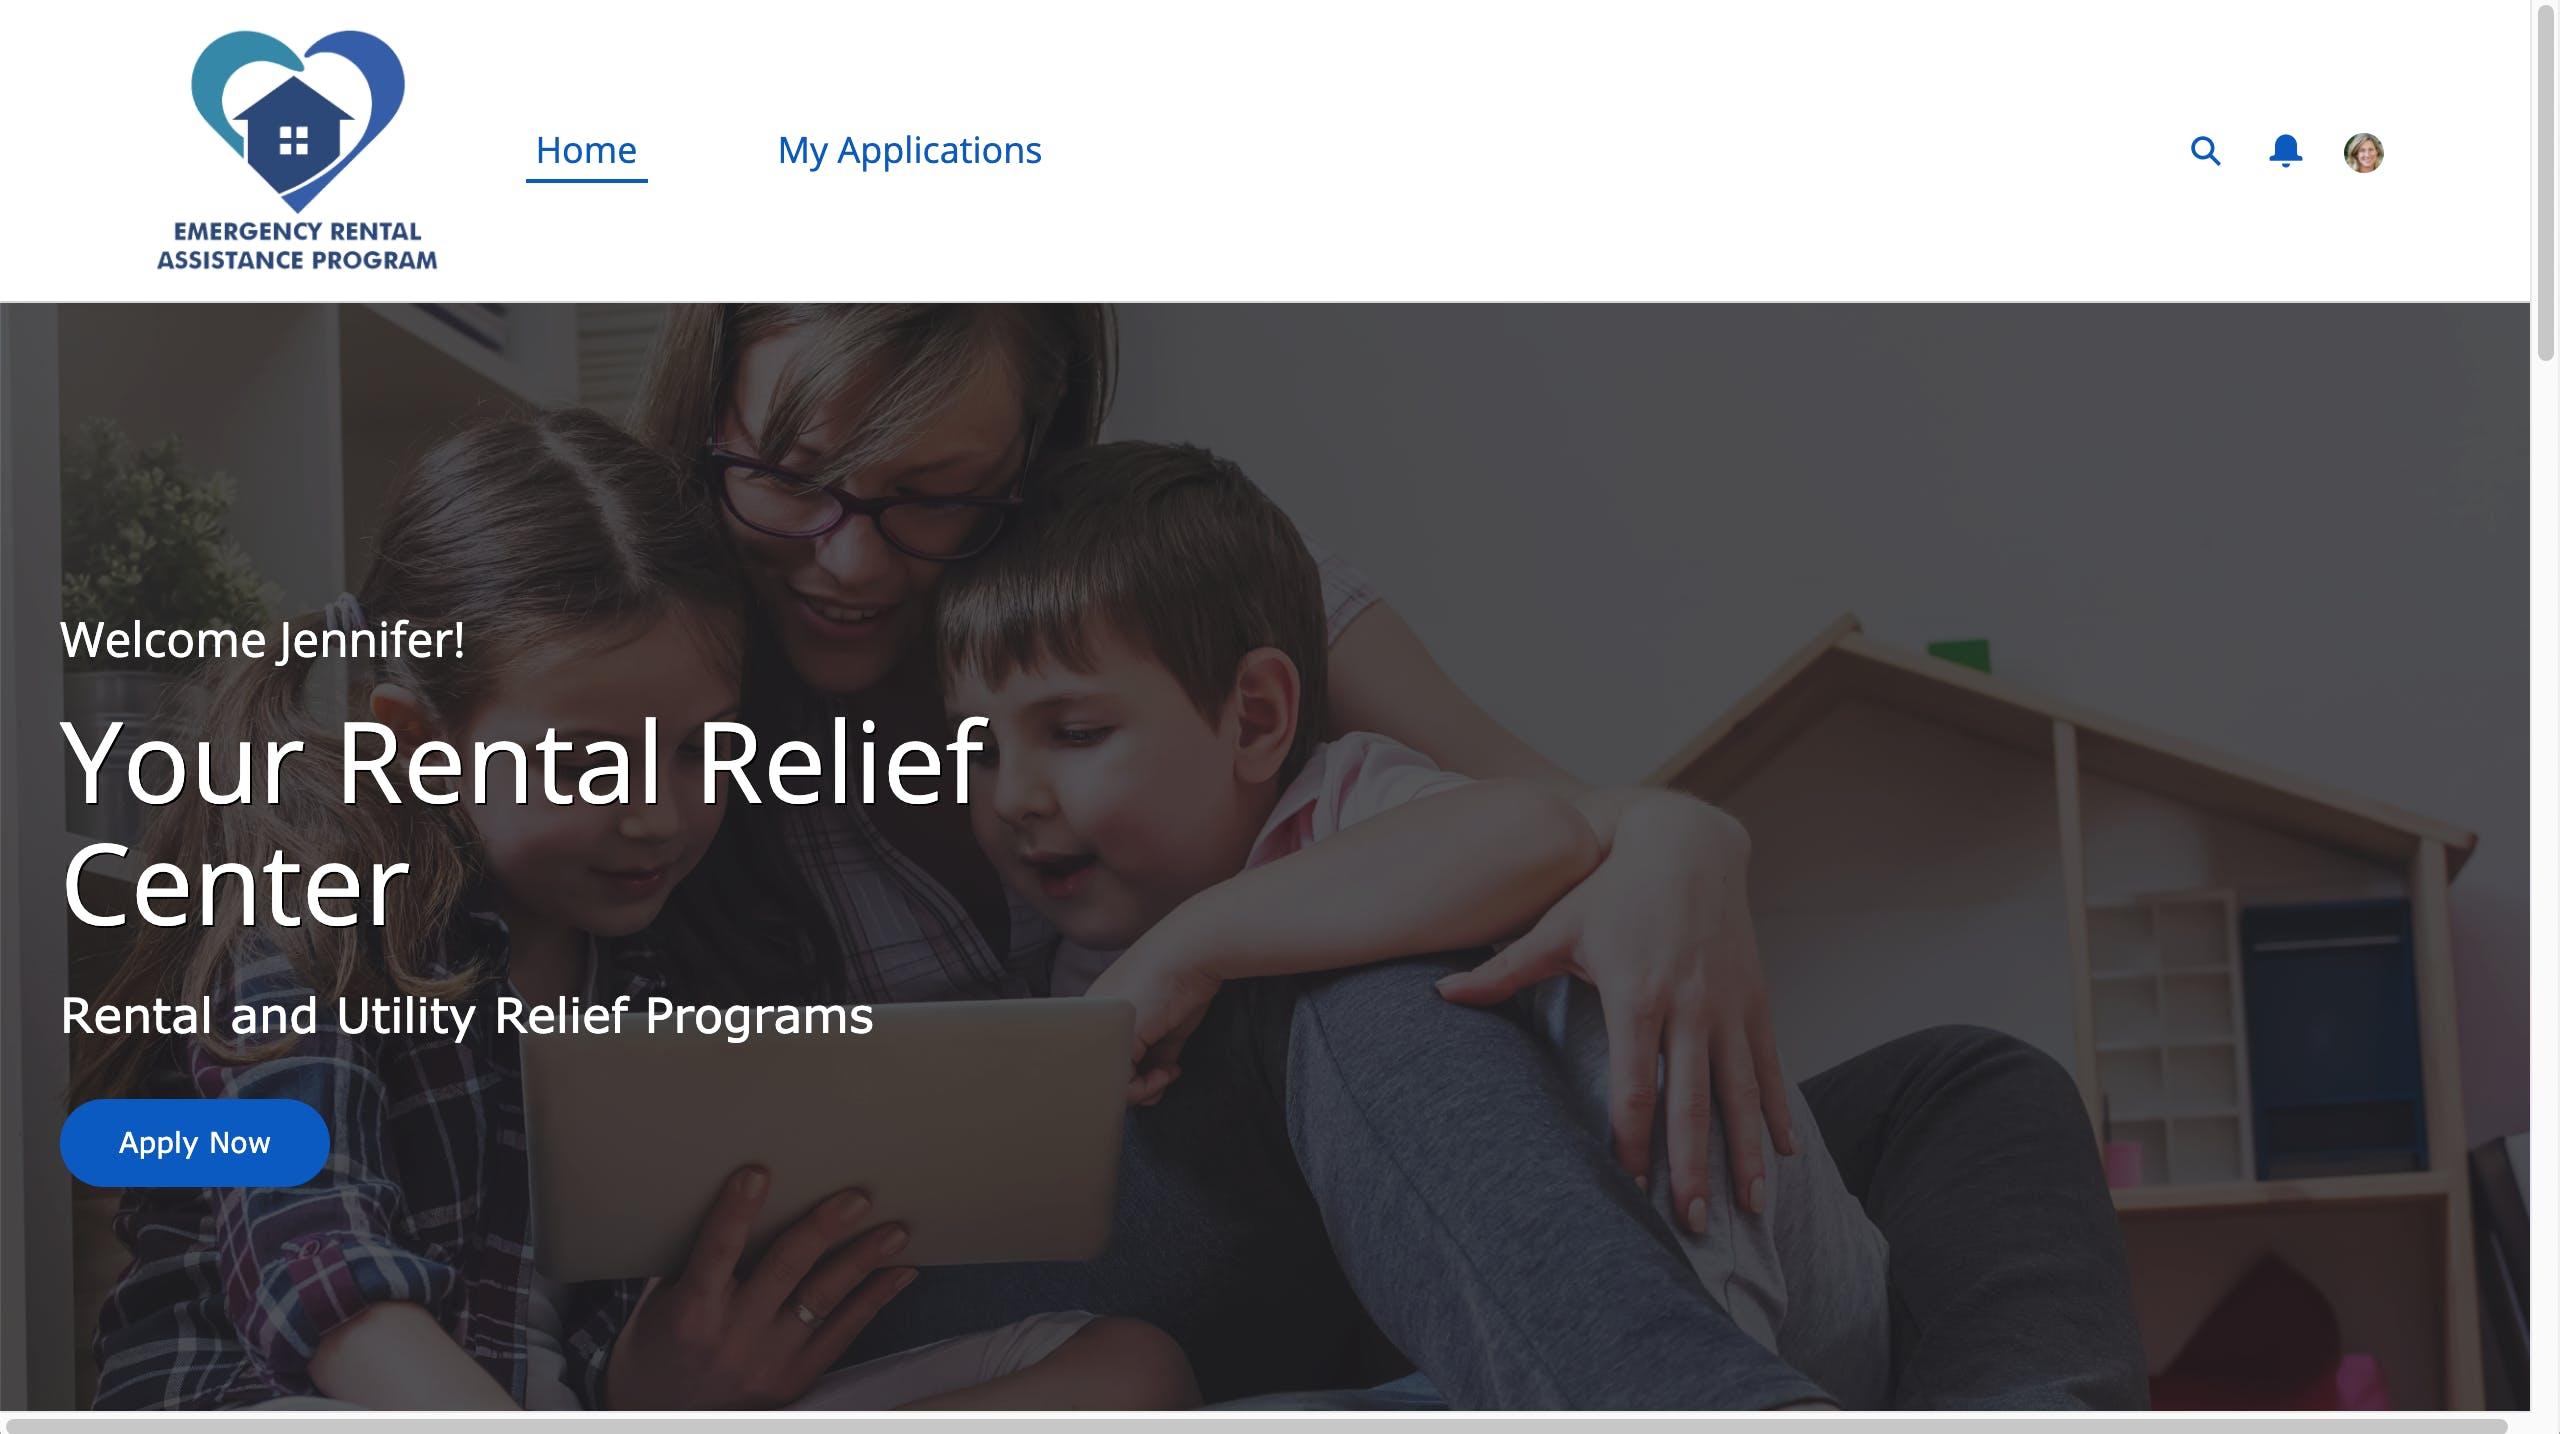 Effectively manage rental assistance programs